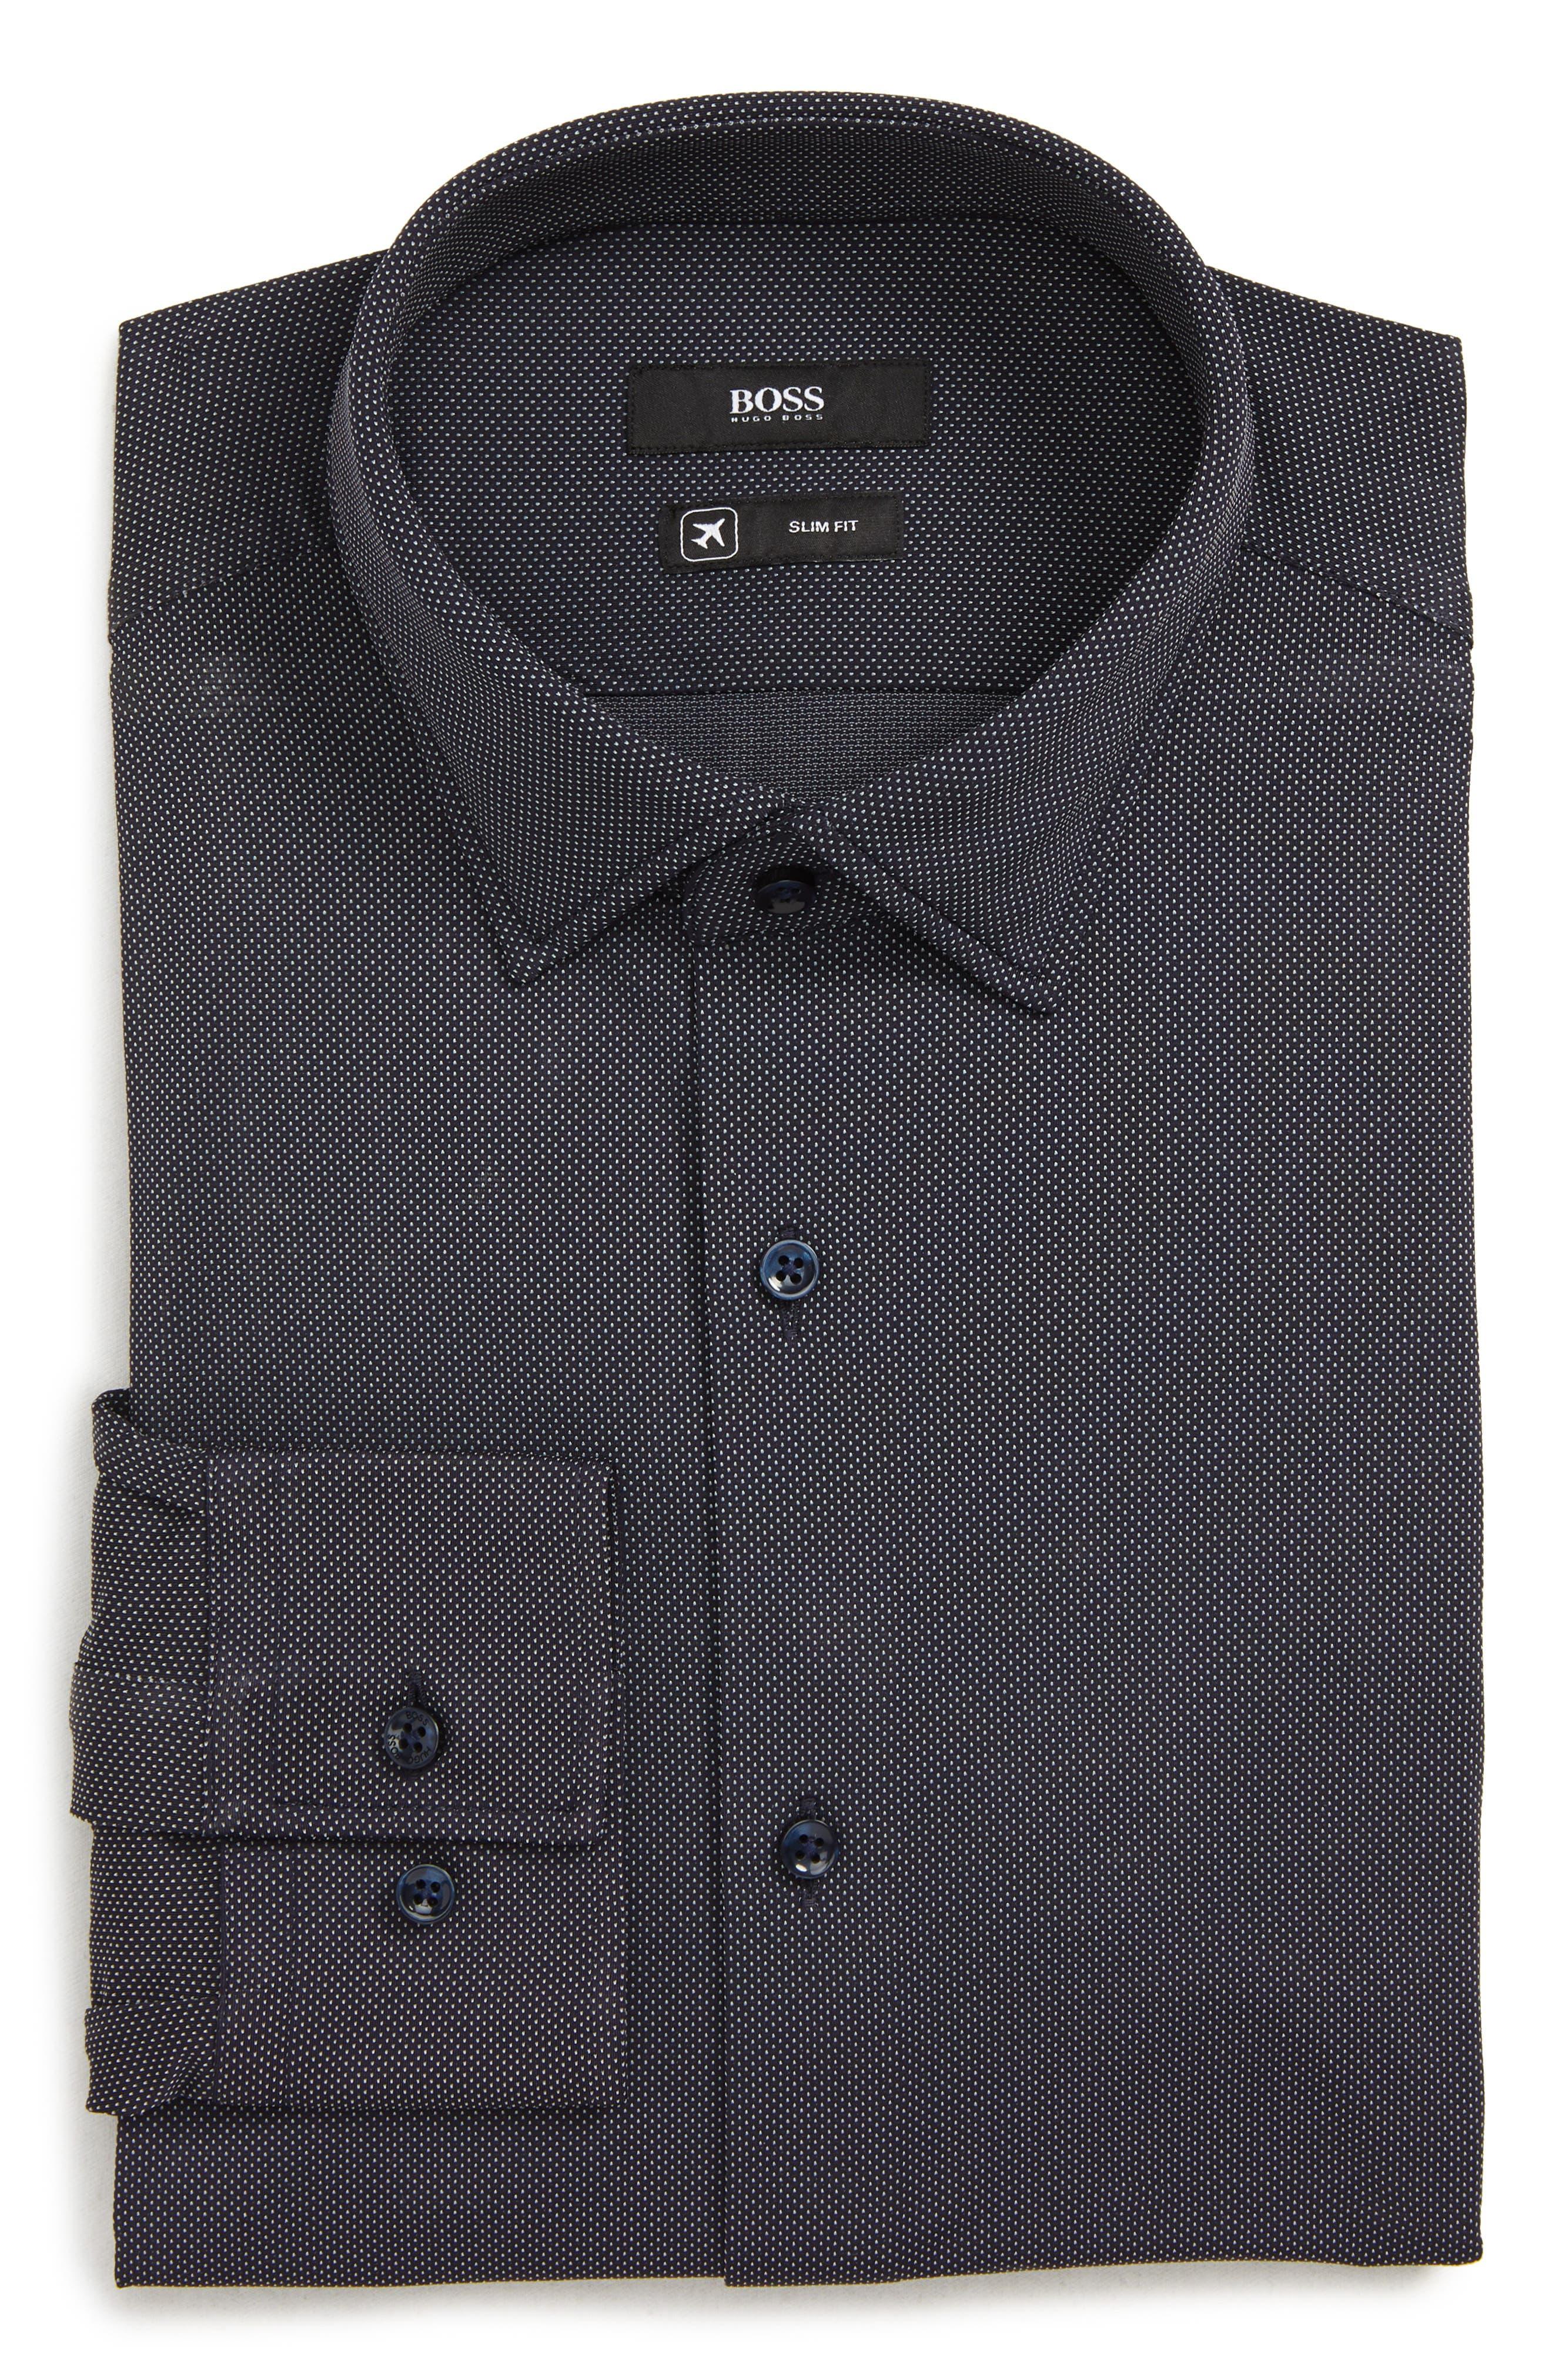 Boss Jenno Slim Fit Stretch Dot Dress Shirt - Blue